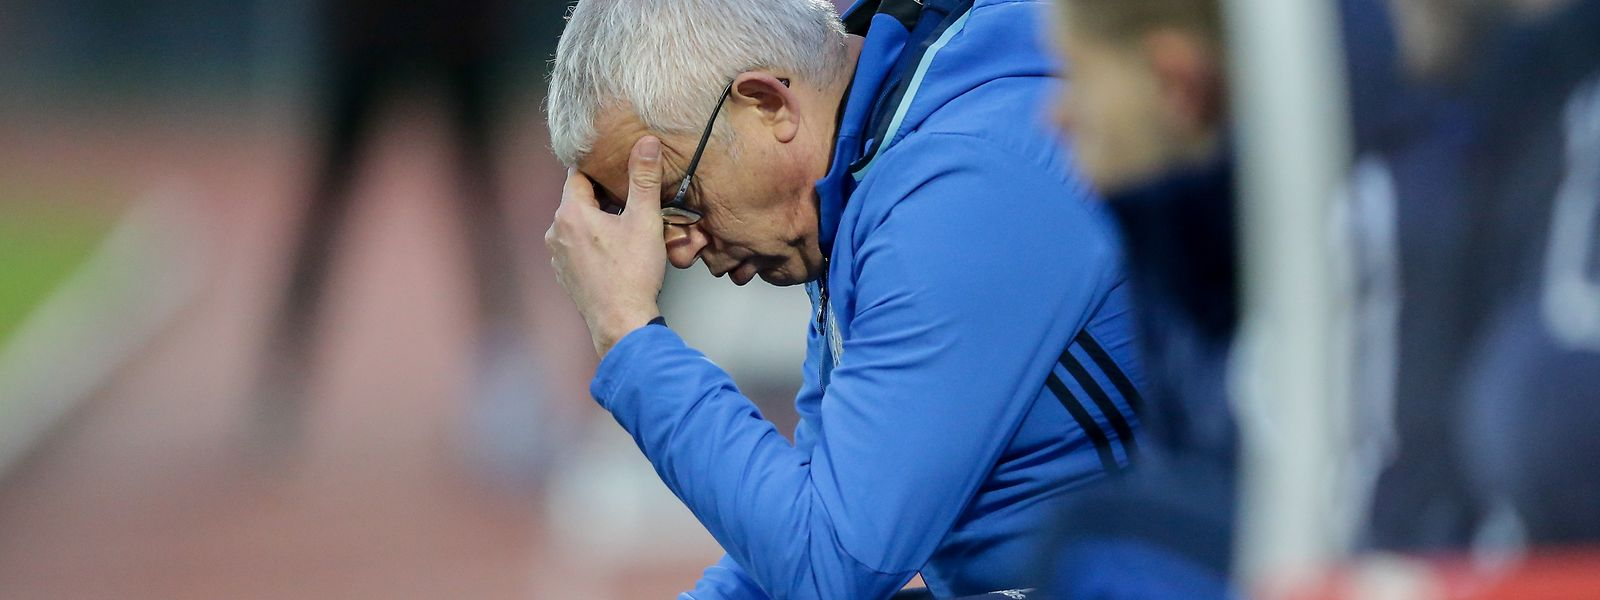 Manuel Peixoto verlässt Grevenmacher nach dem Auftaktspiel.